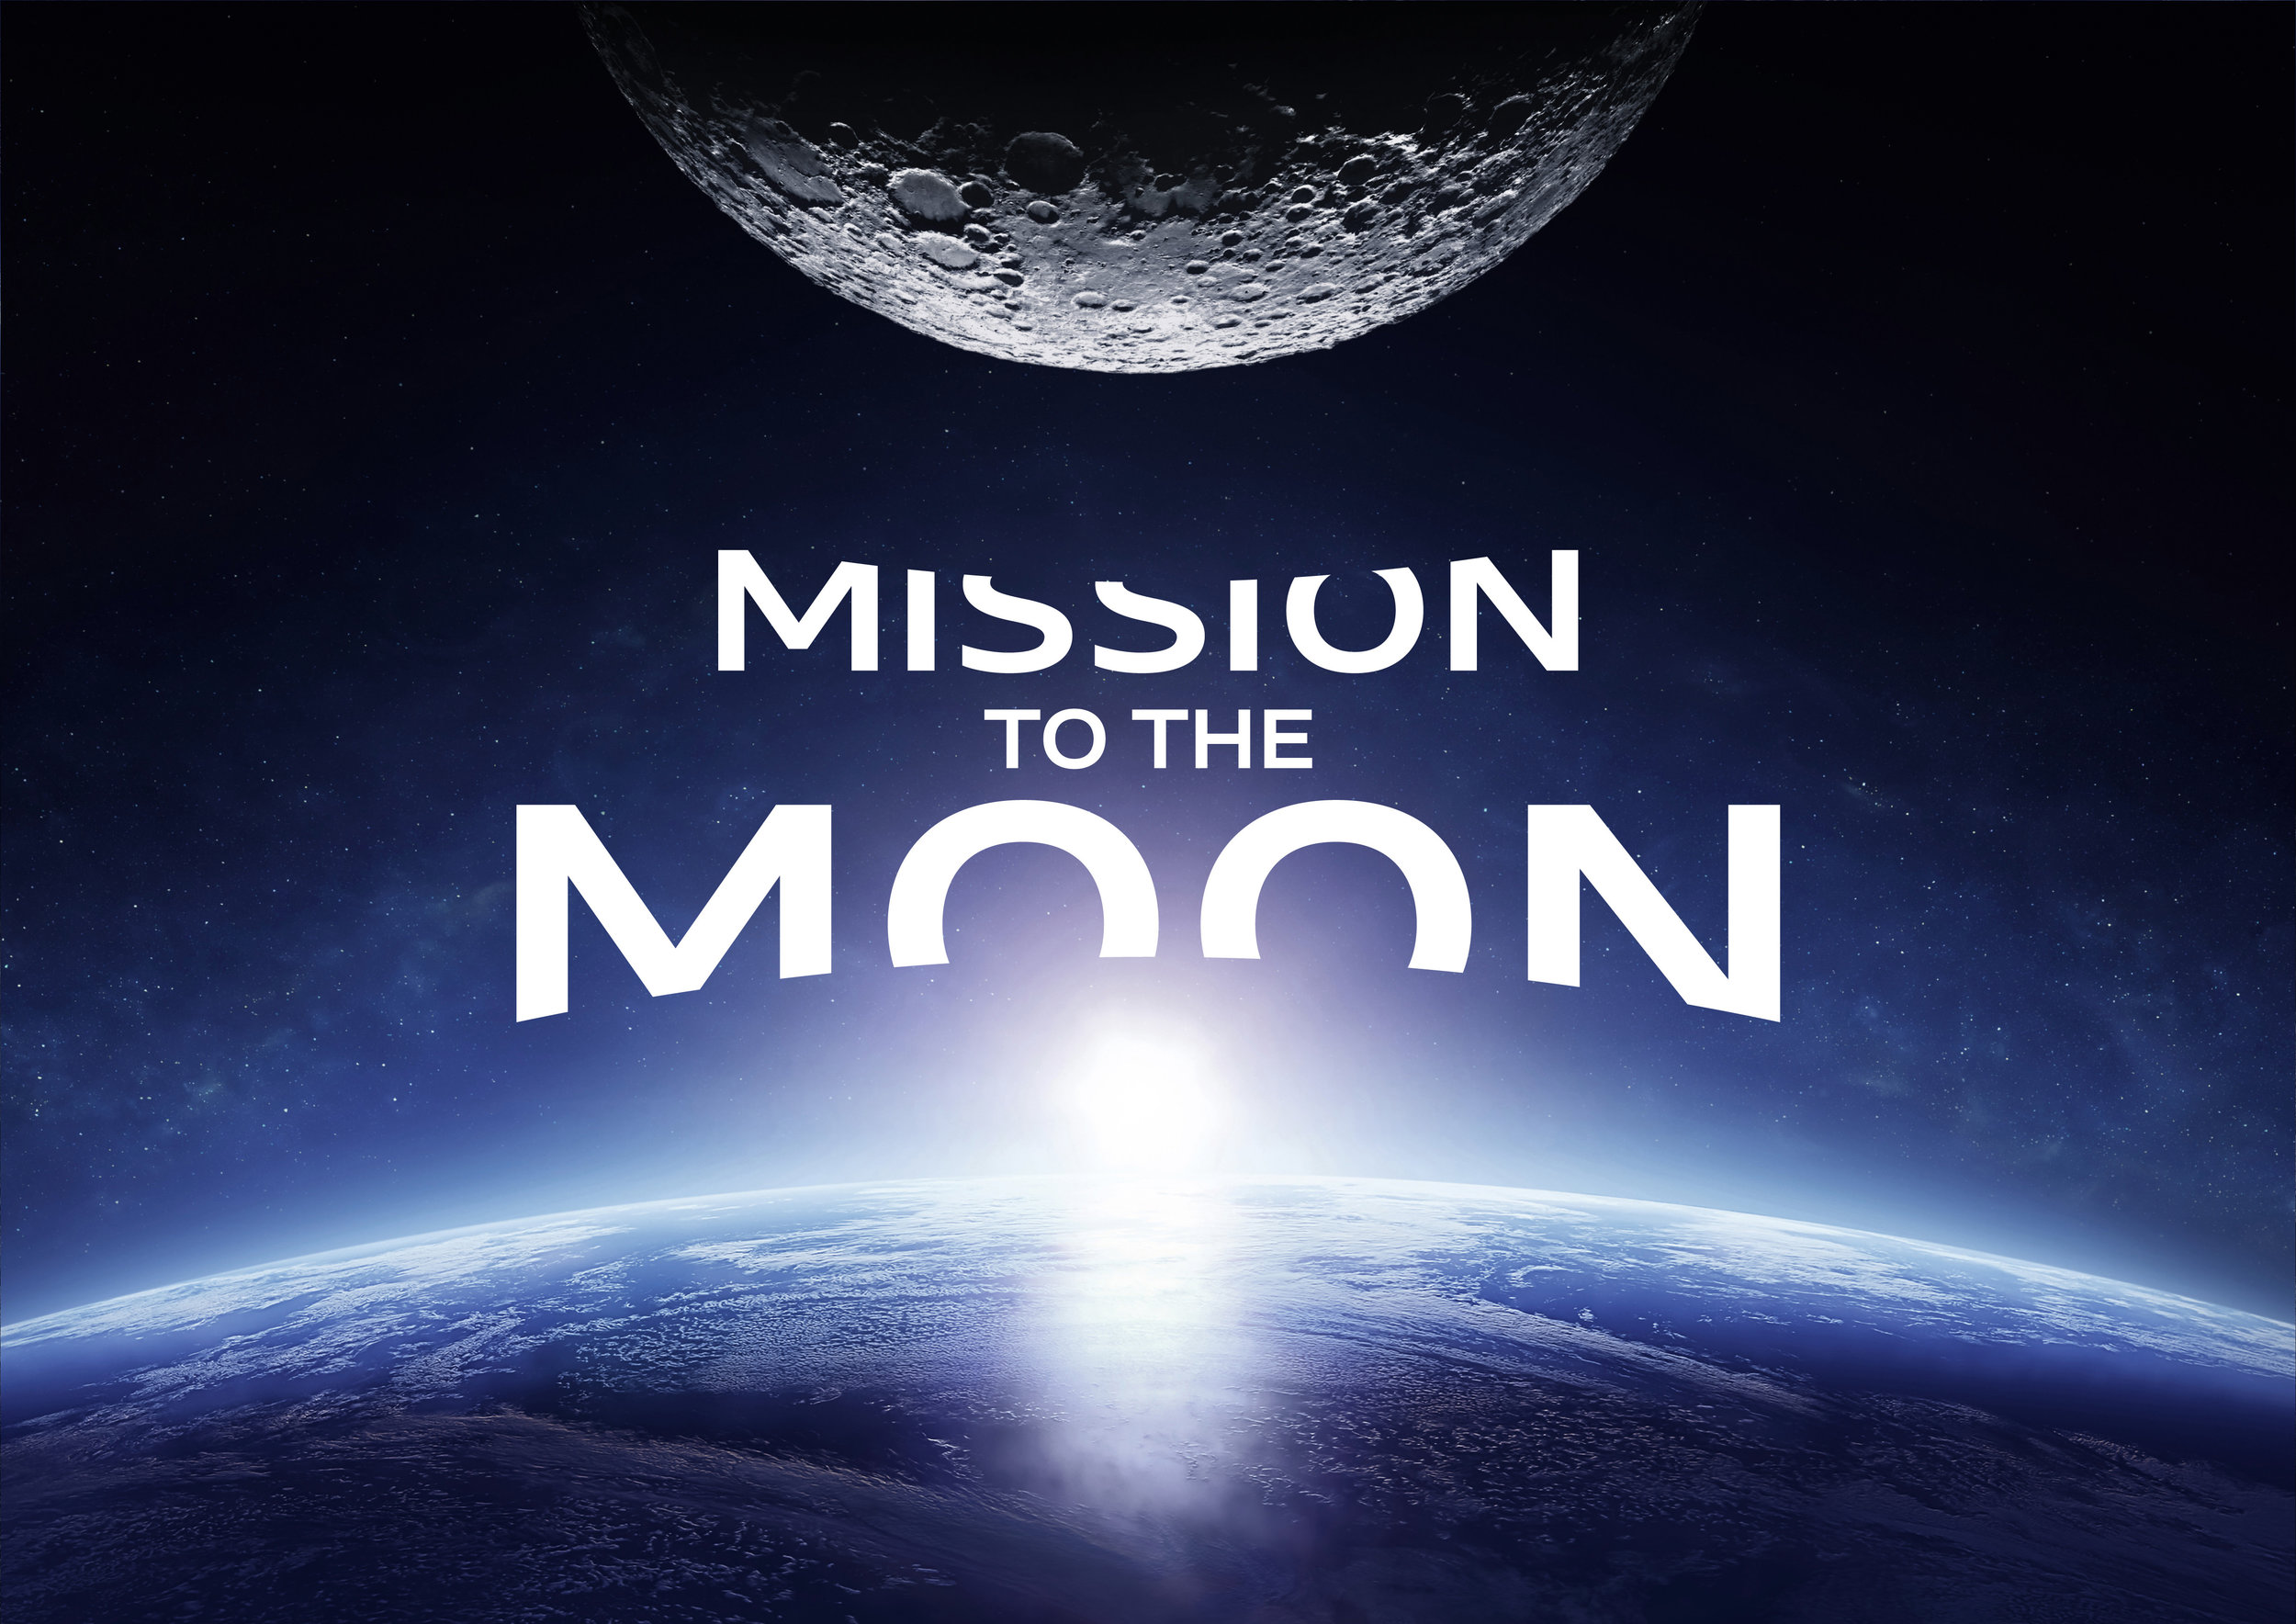 MissionToTheMoon.jpg